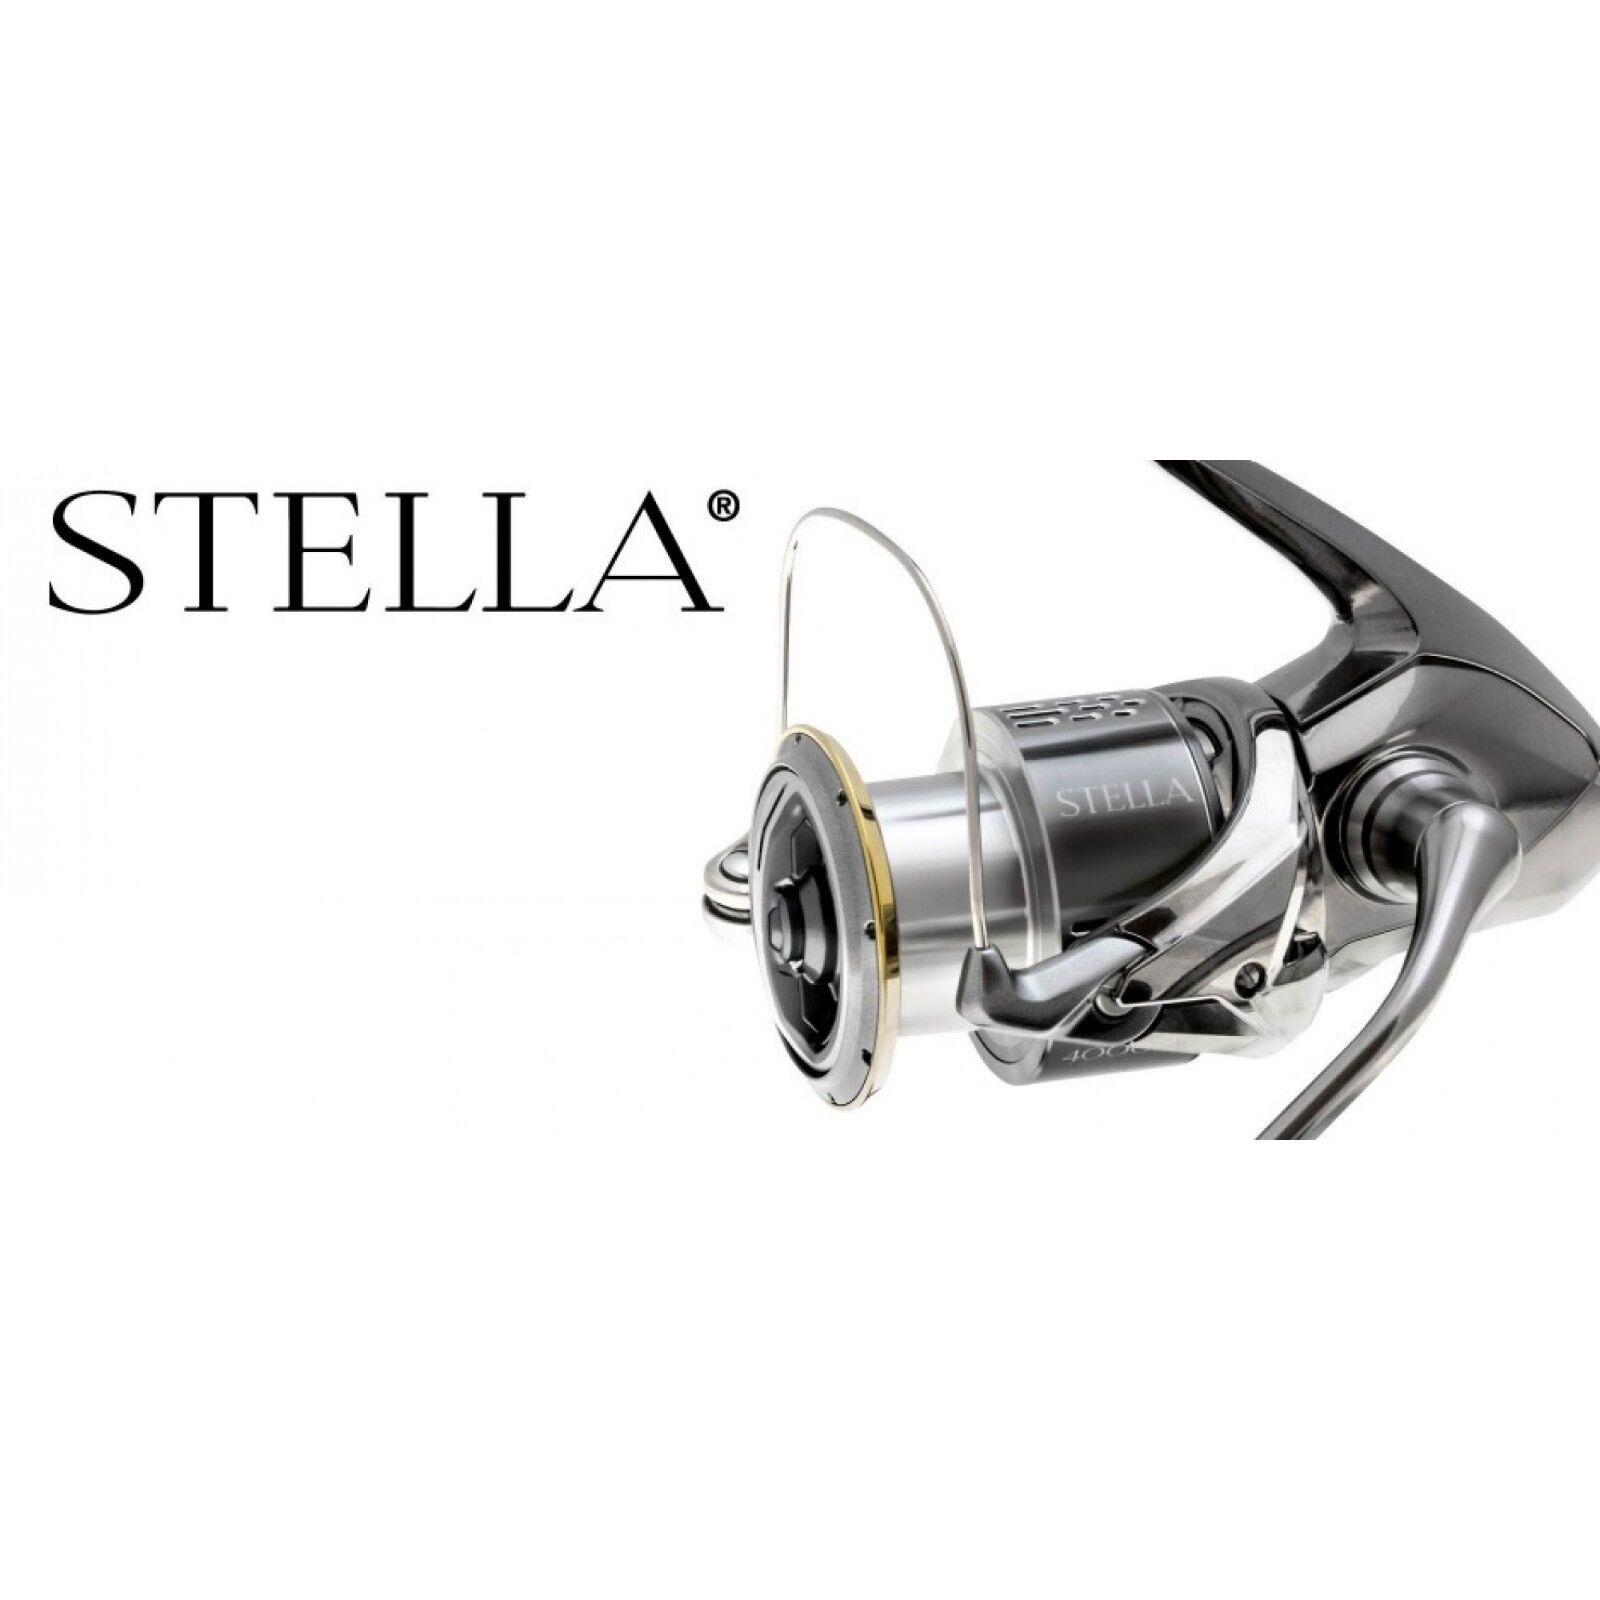 MULINELLO SHIMANO STELLA 4000 XG FJ  POWER PRO D.0,15 MT 275